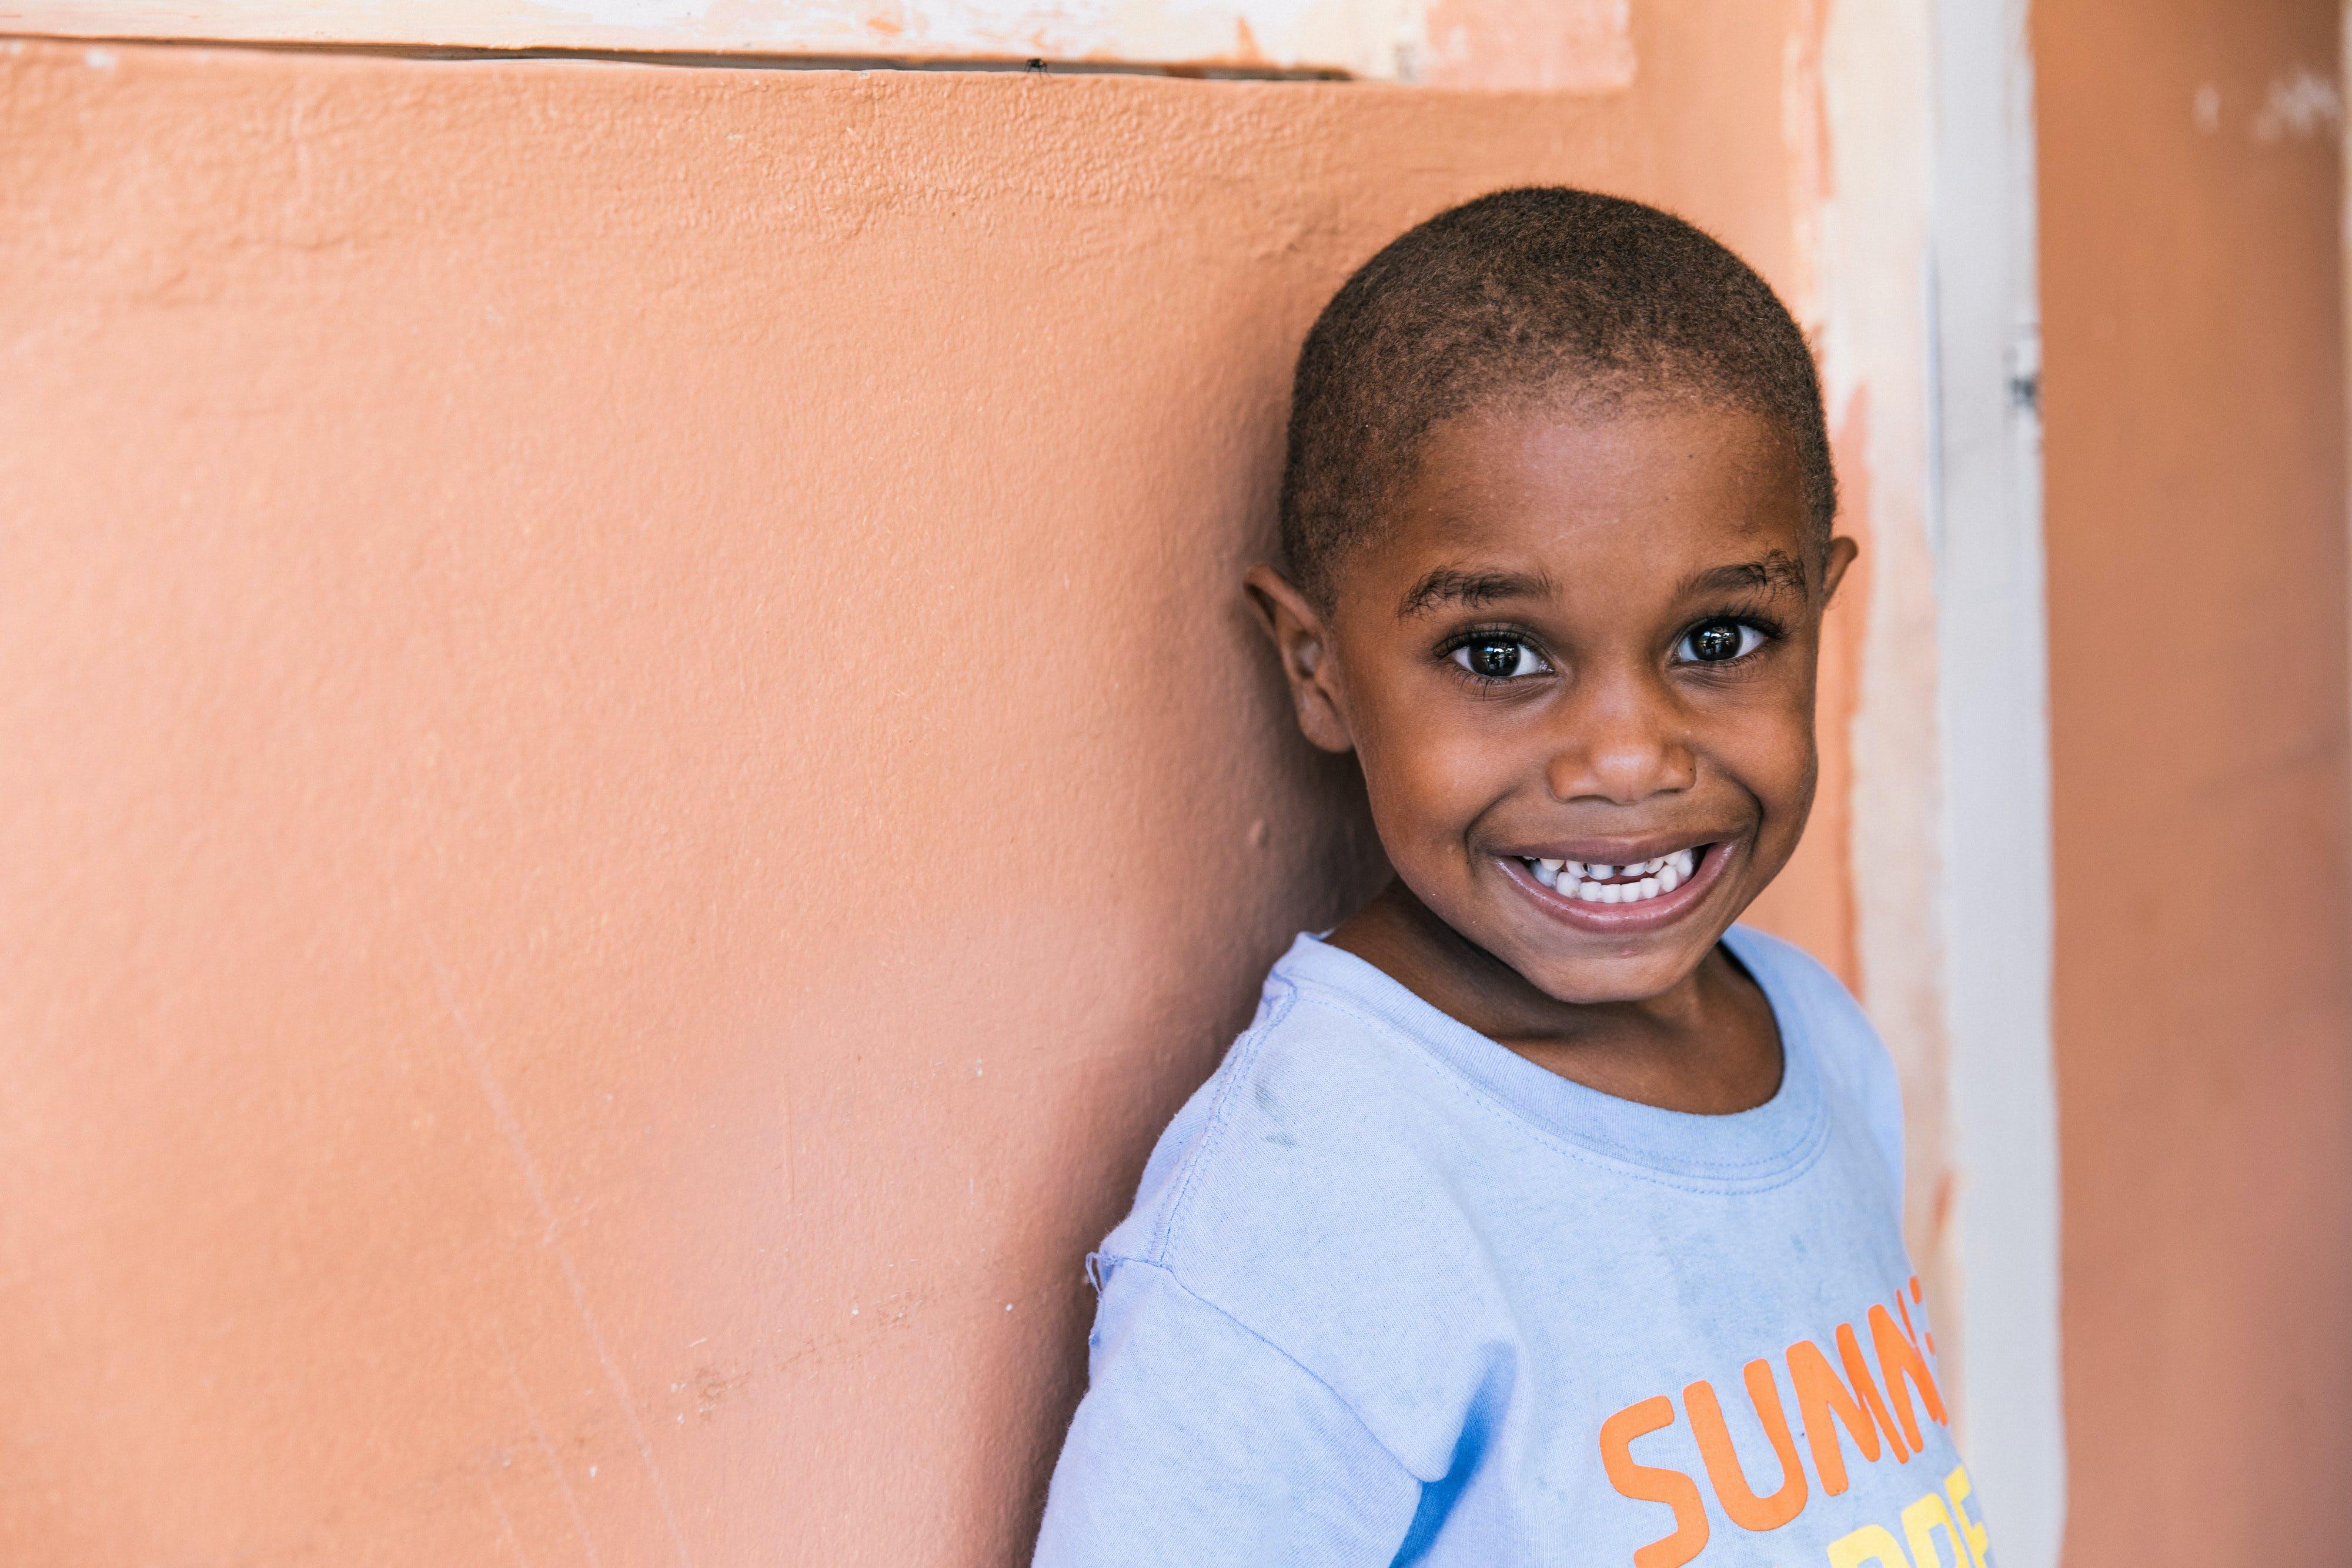 Sponsored child in the Dominican Republic